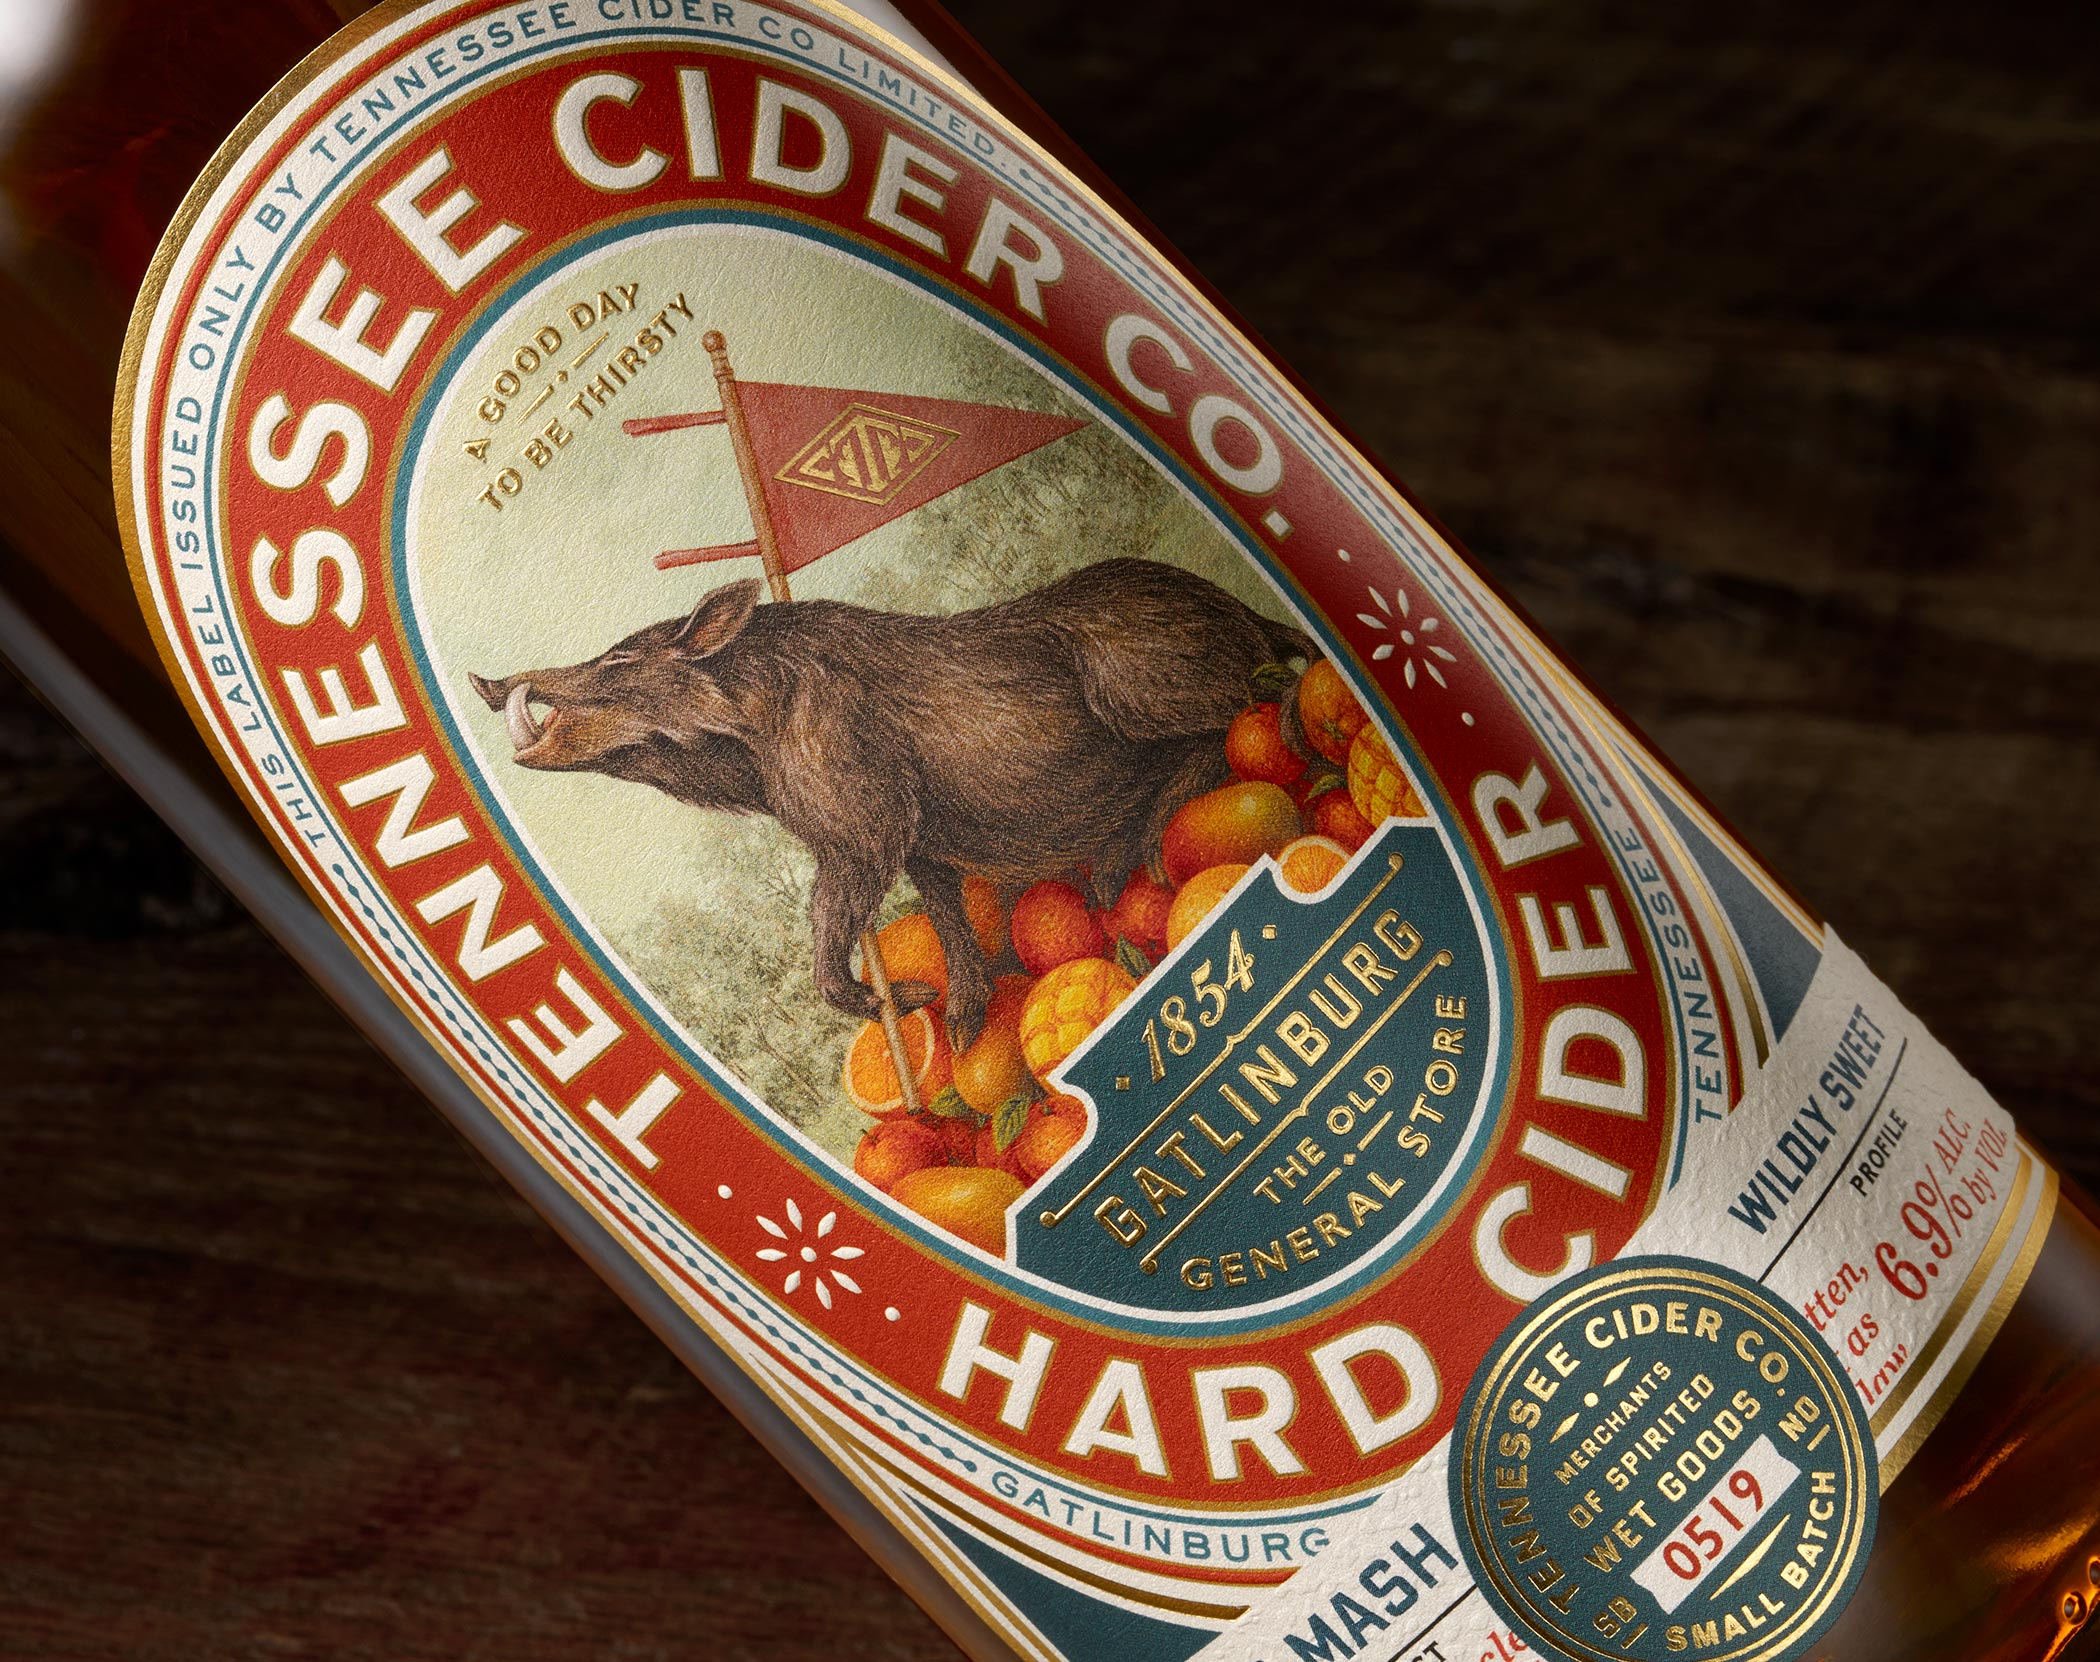 Cider & Branding: Tennessee Cider Co.